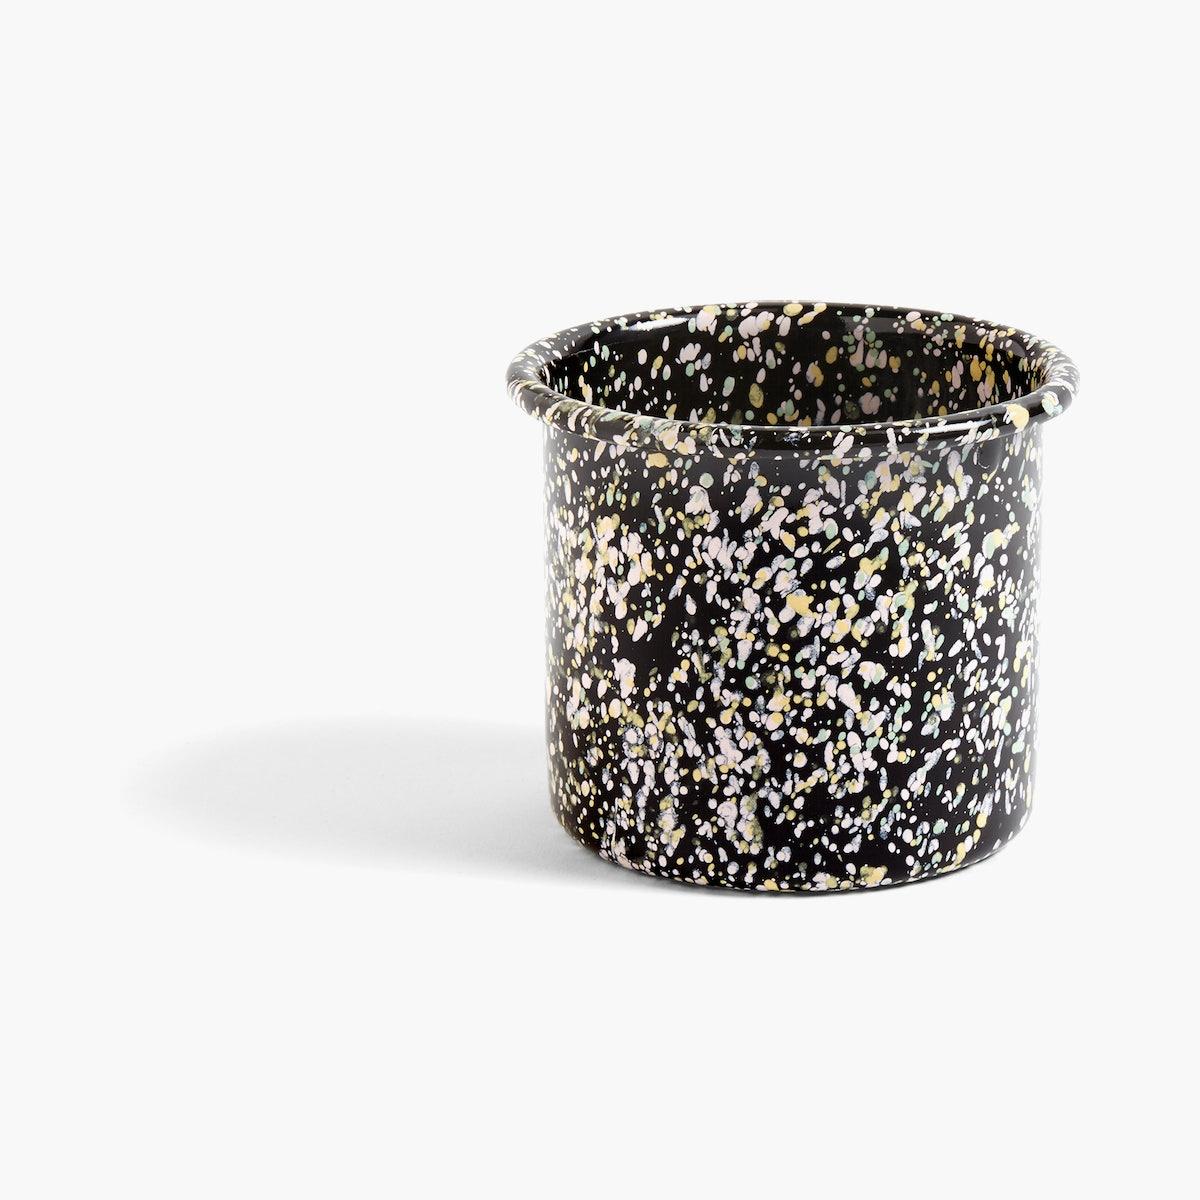 Enamel Herb Pot